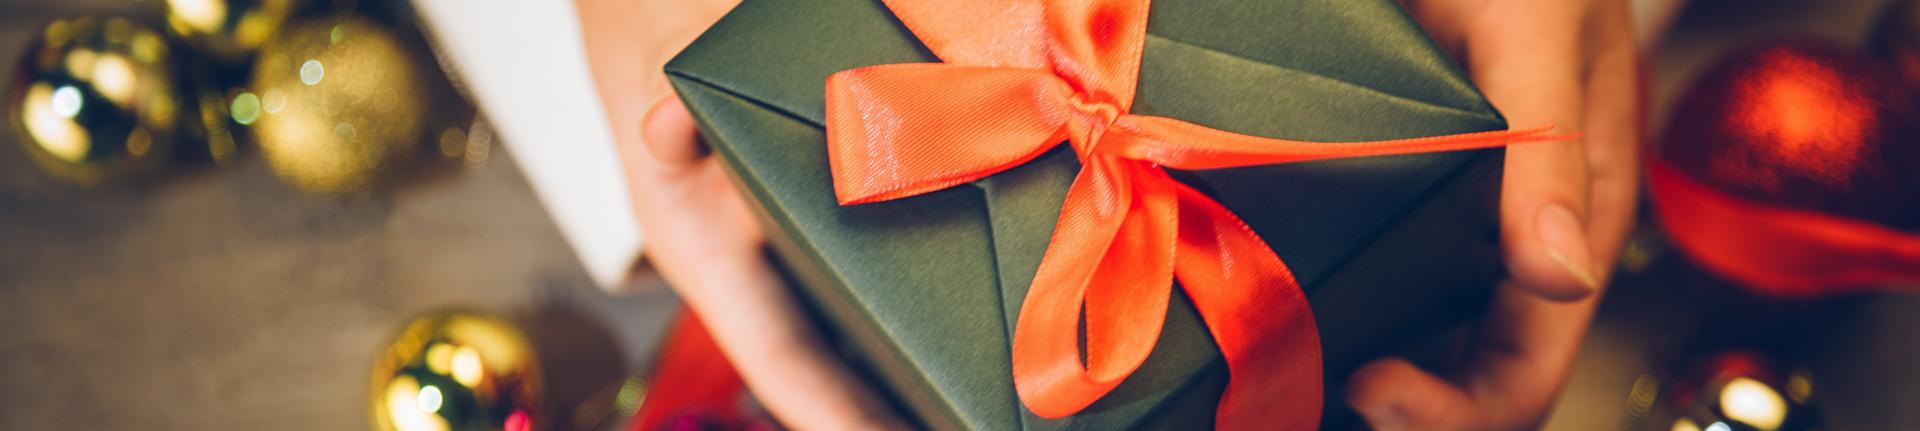 Kit de presente para o Natal: como montar o seu